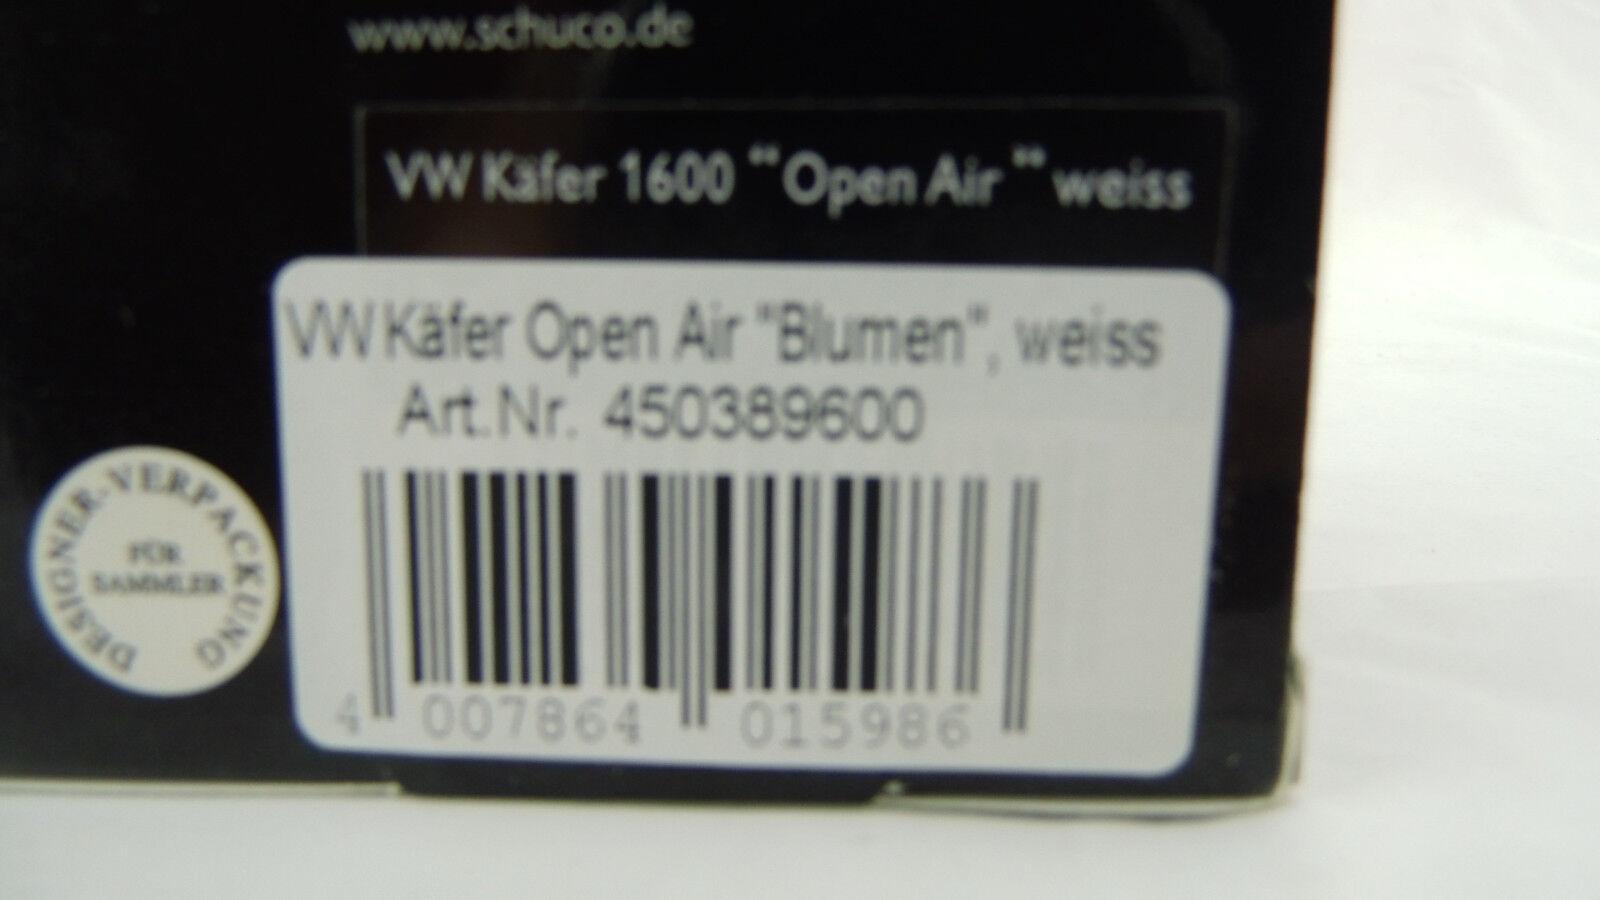 Schuco 1 43 VW Beetle Open Air Fleurs Blanc 450389600 450389600 450389600 neuf dans sa boîte f20e93